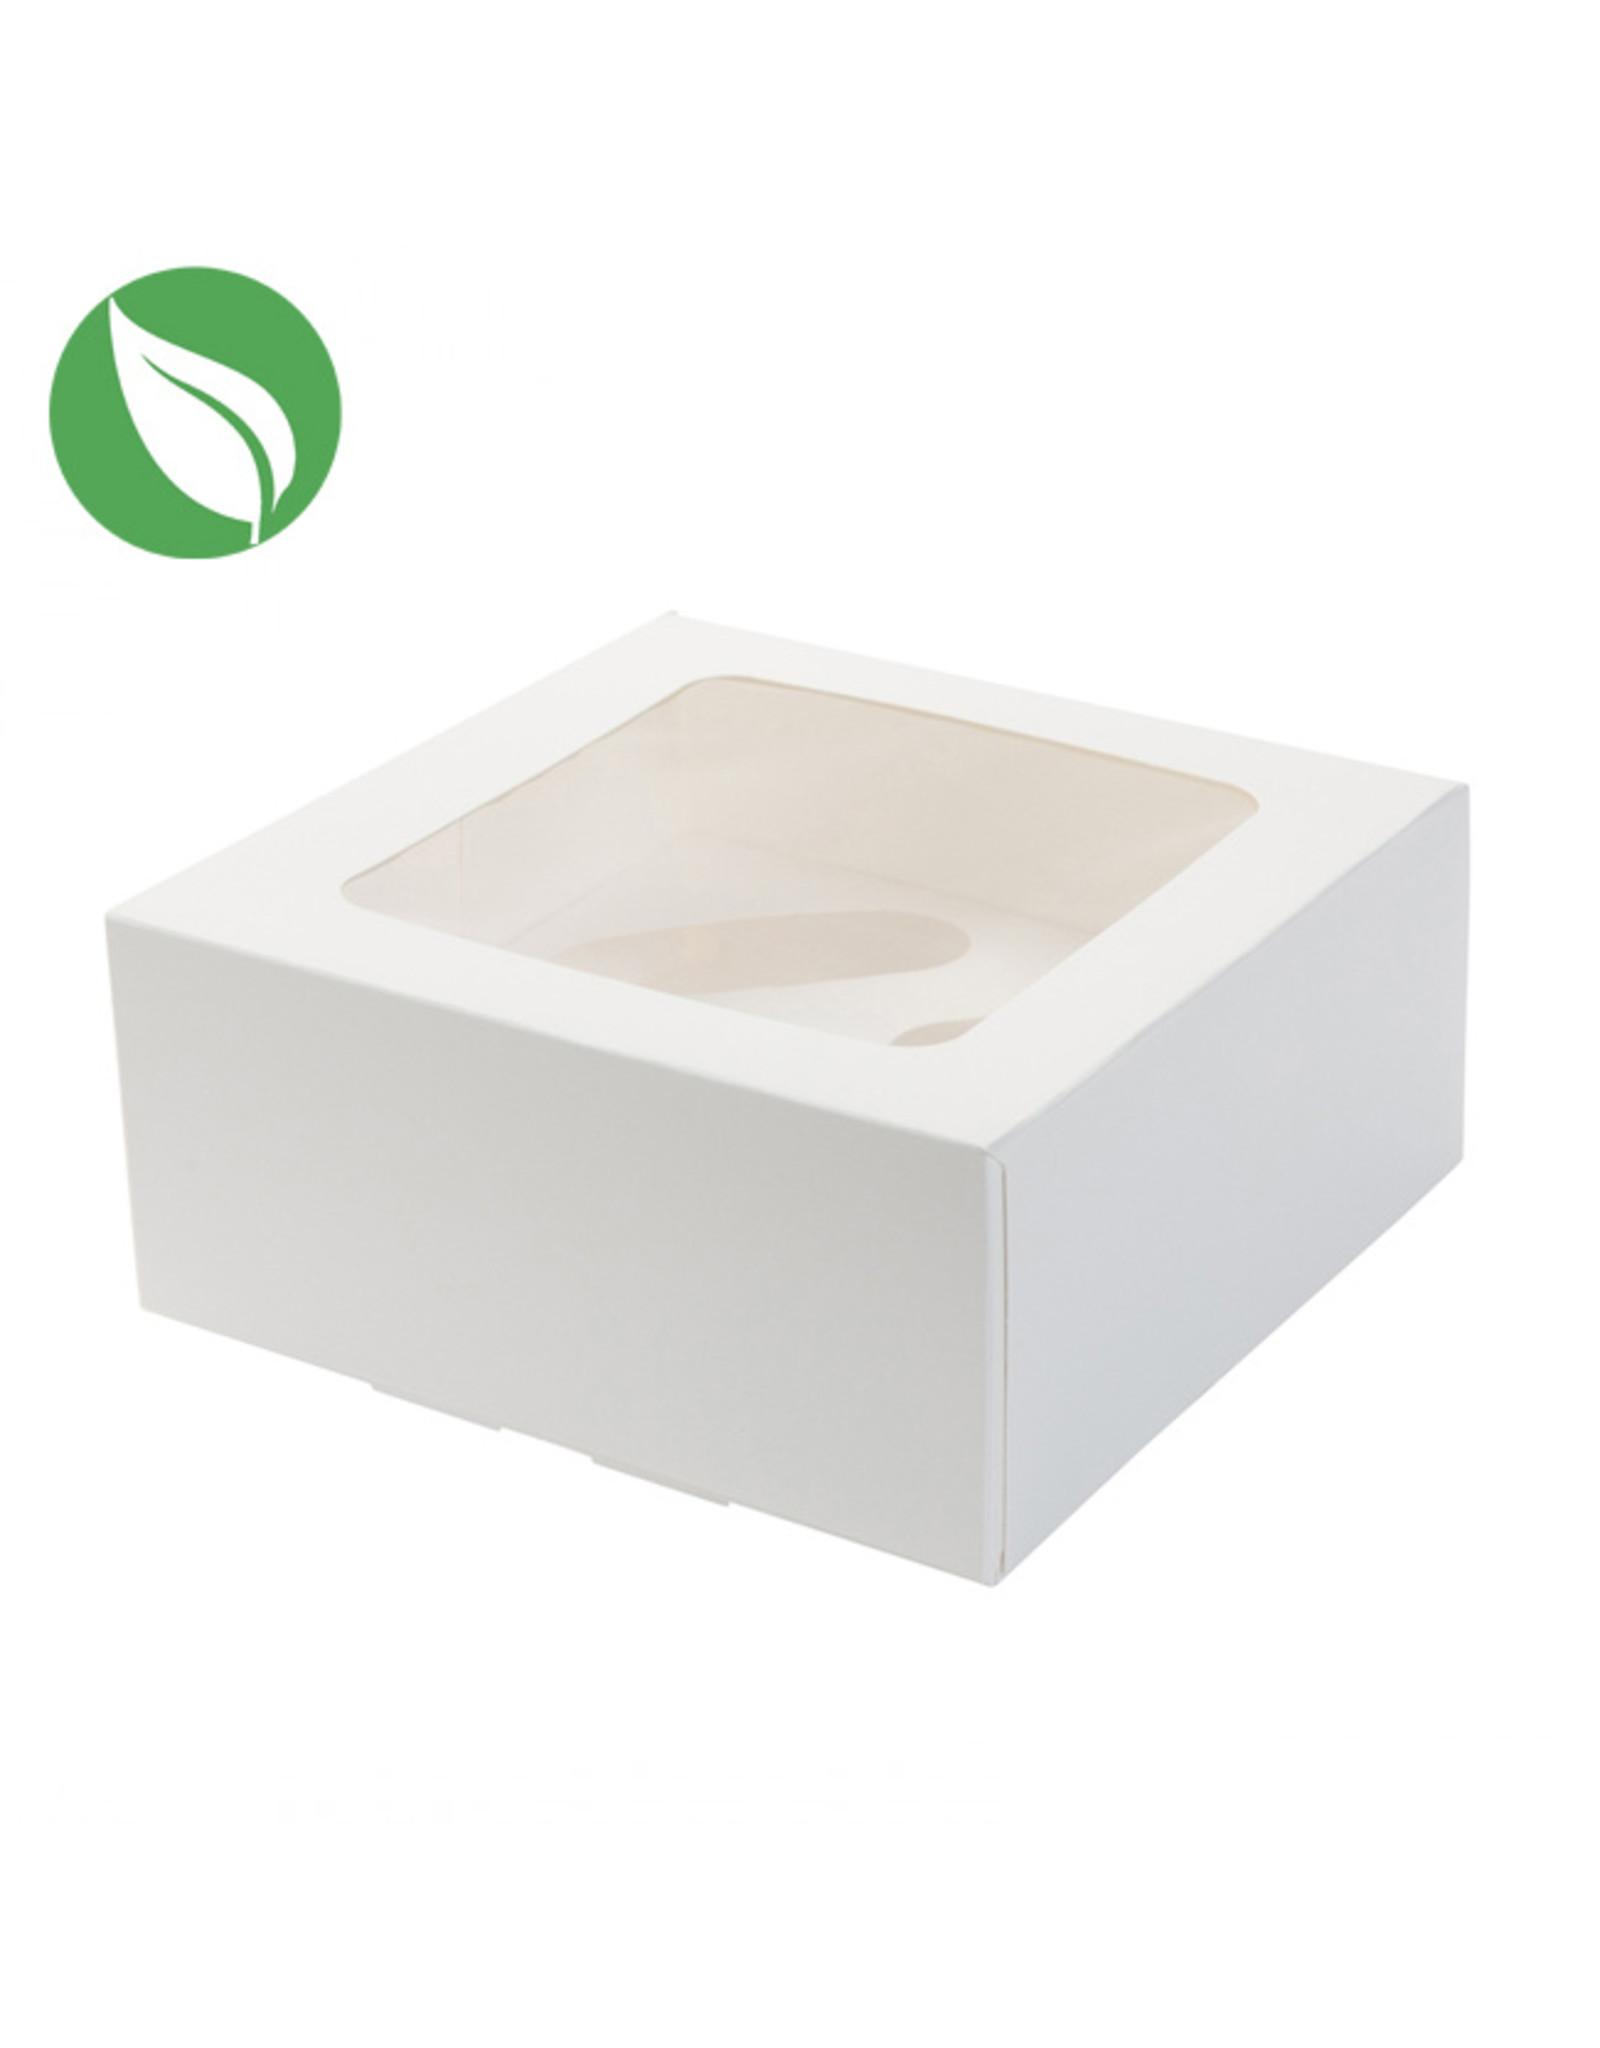 Biodegradable box for 4 (mini) cupcakes (per 25 pieces)